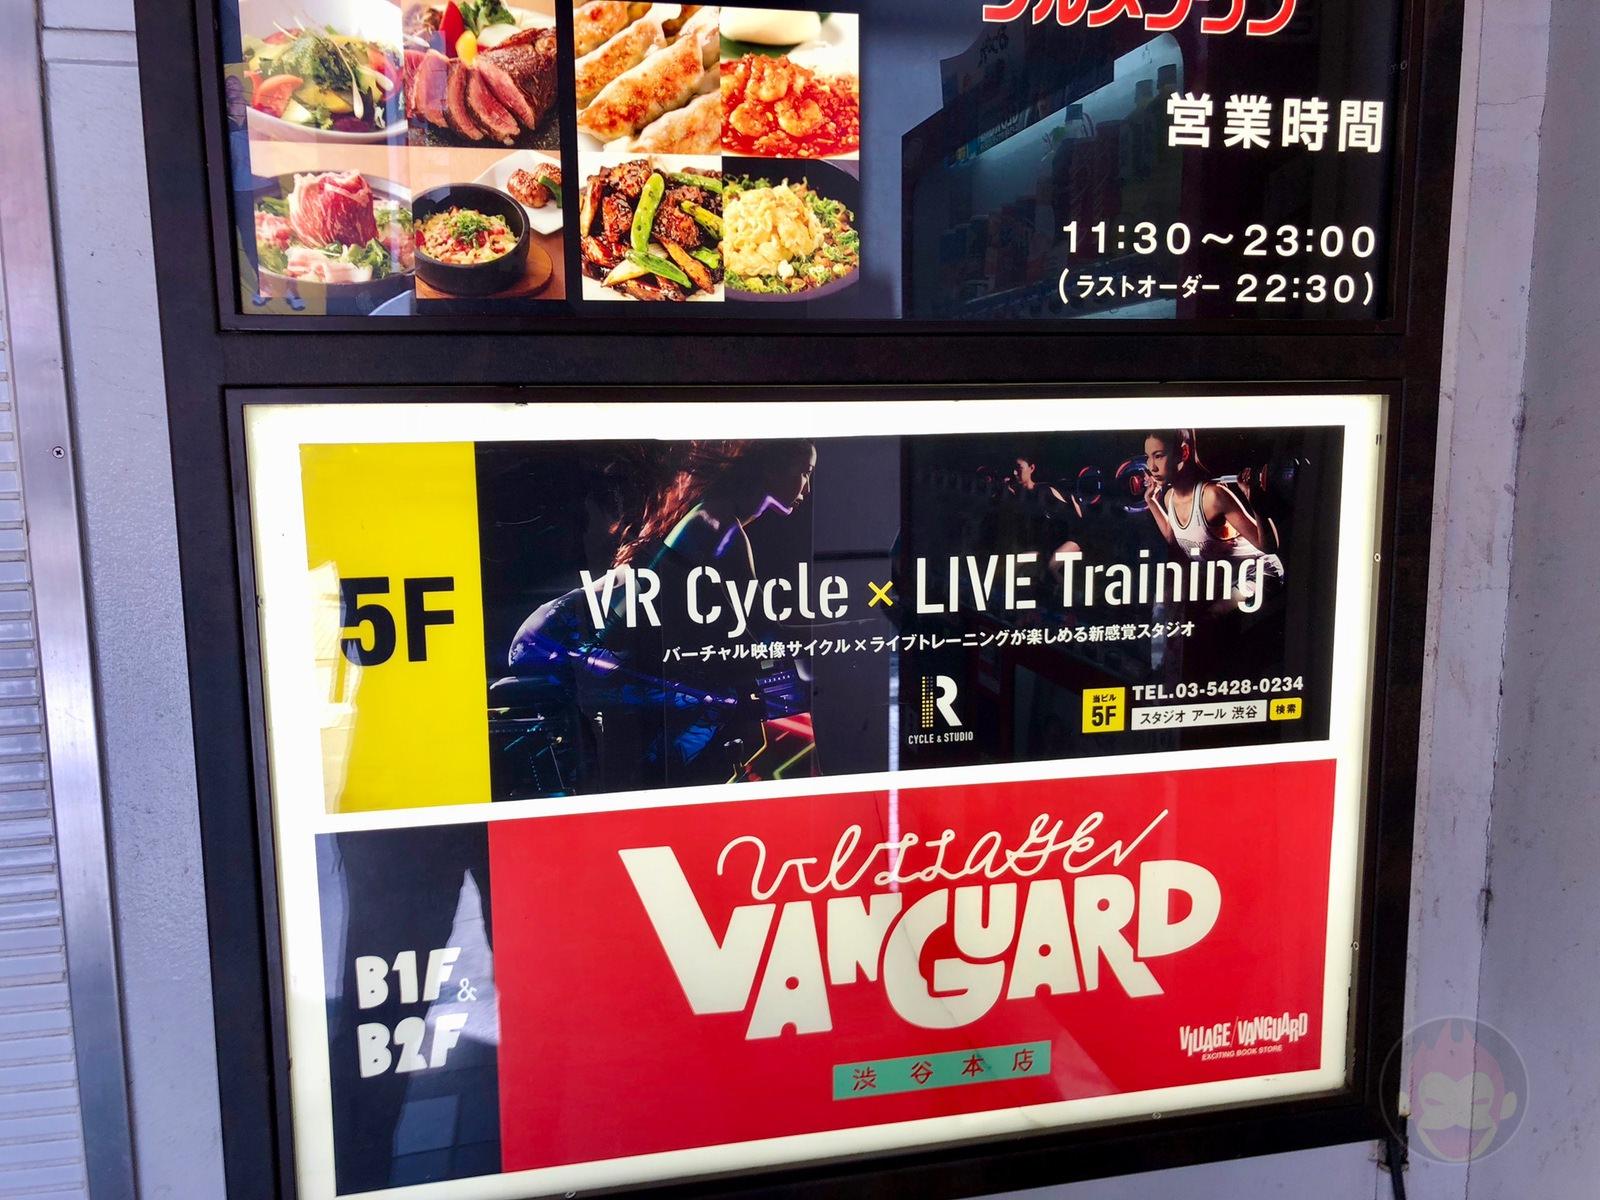 Cycle-and-Studio-R-Shibuya-03.jpg